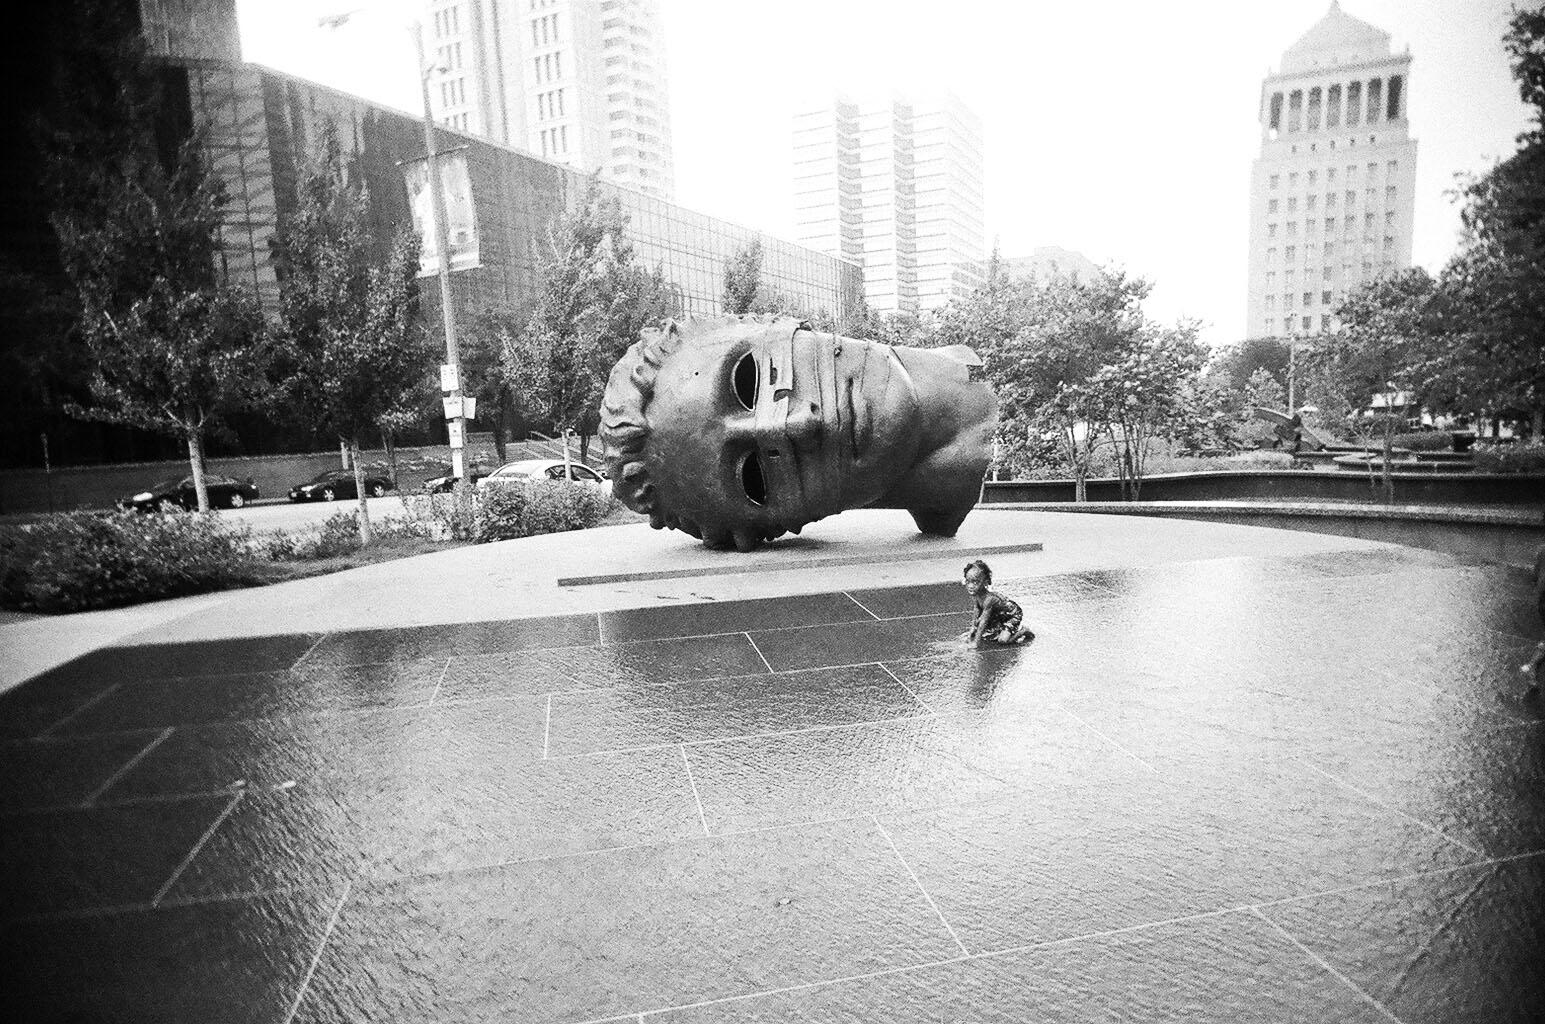 GROUND CONTROL, Urban Architecture II Exhibit